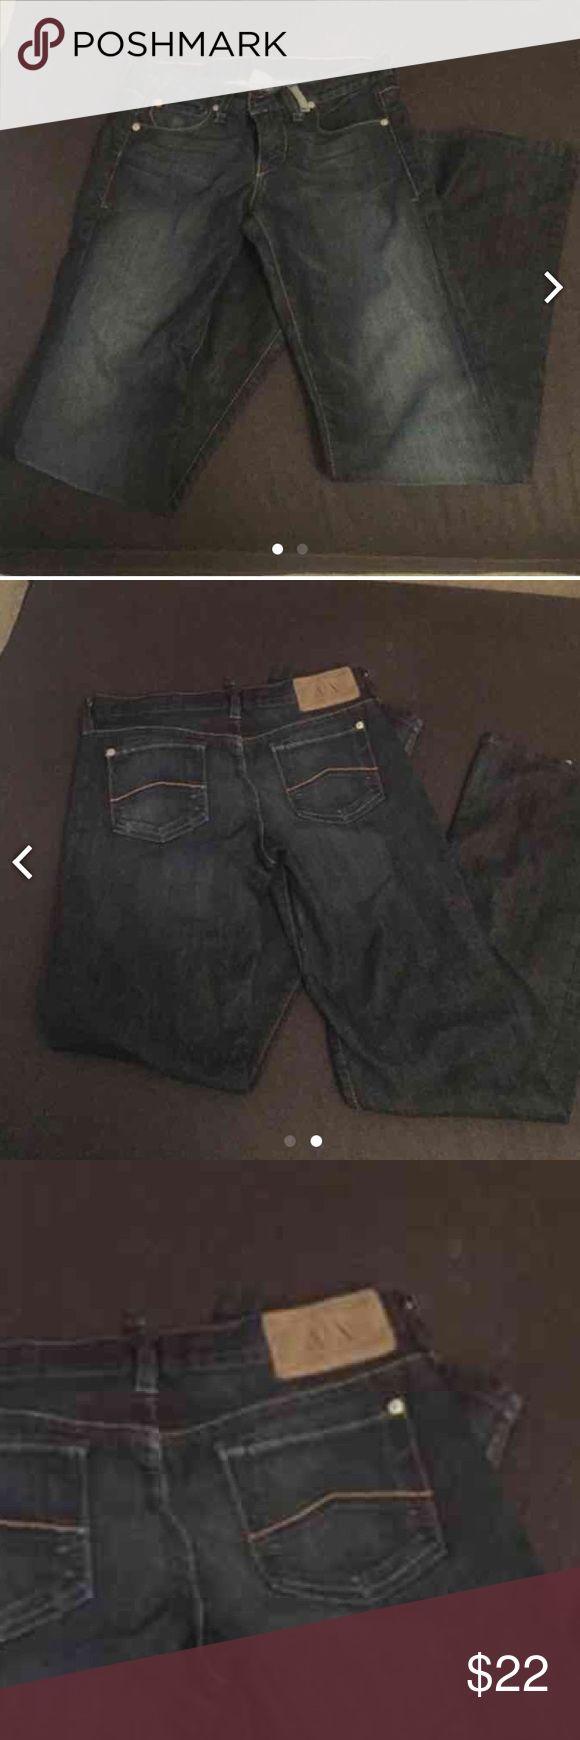 Like new Armani exchange jeans Worn 2-3 times. A/X Armani Exchange Jeans Boot Cut